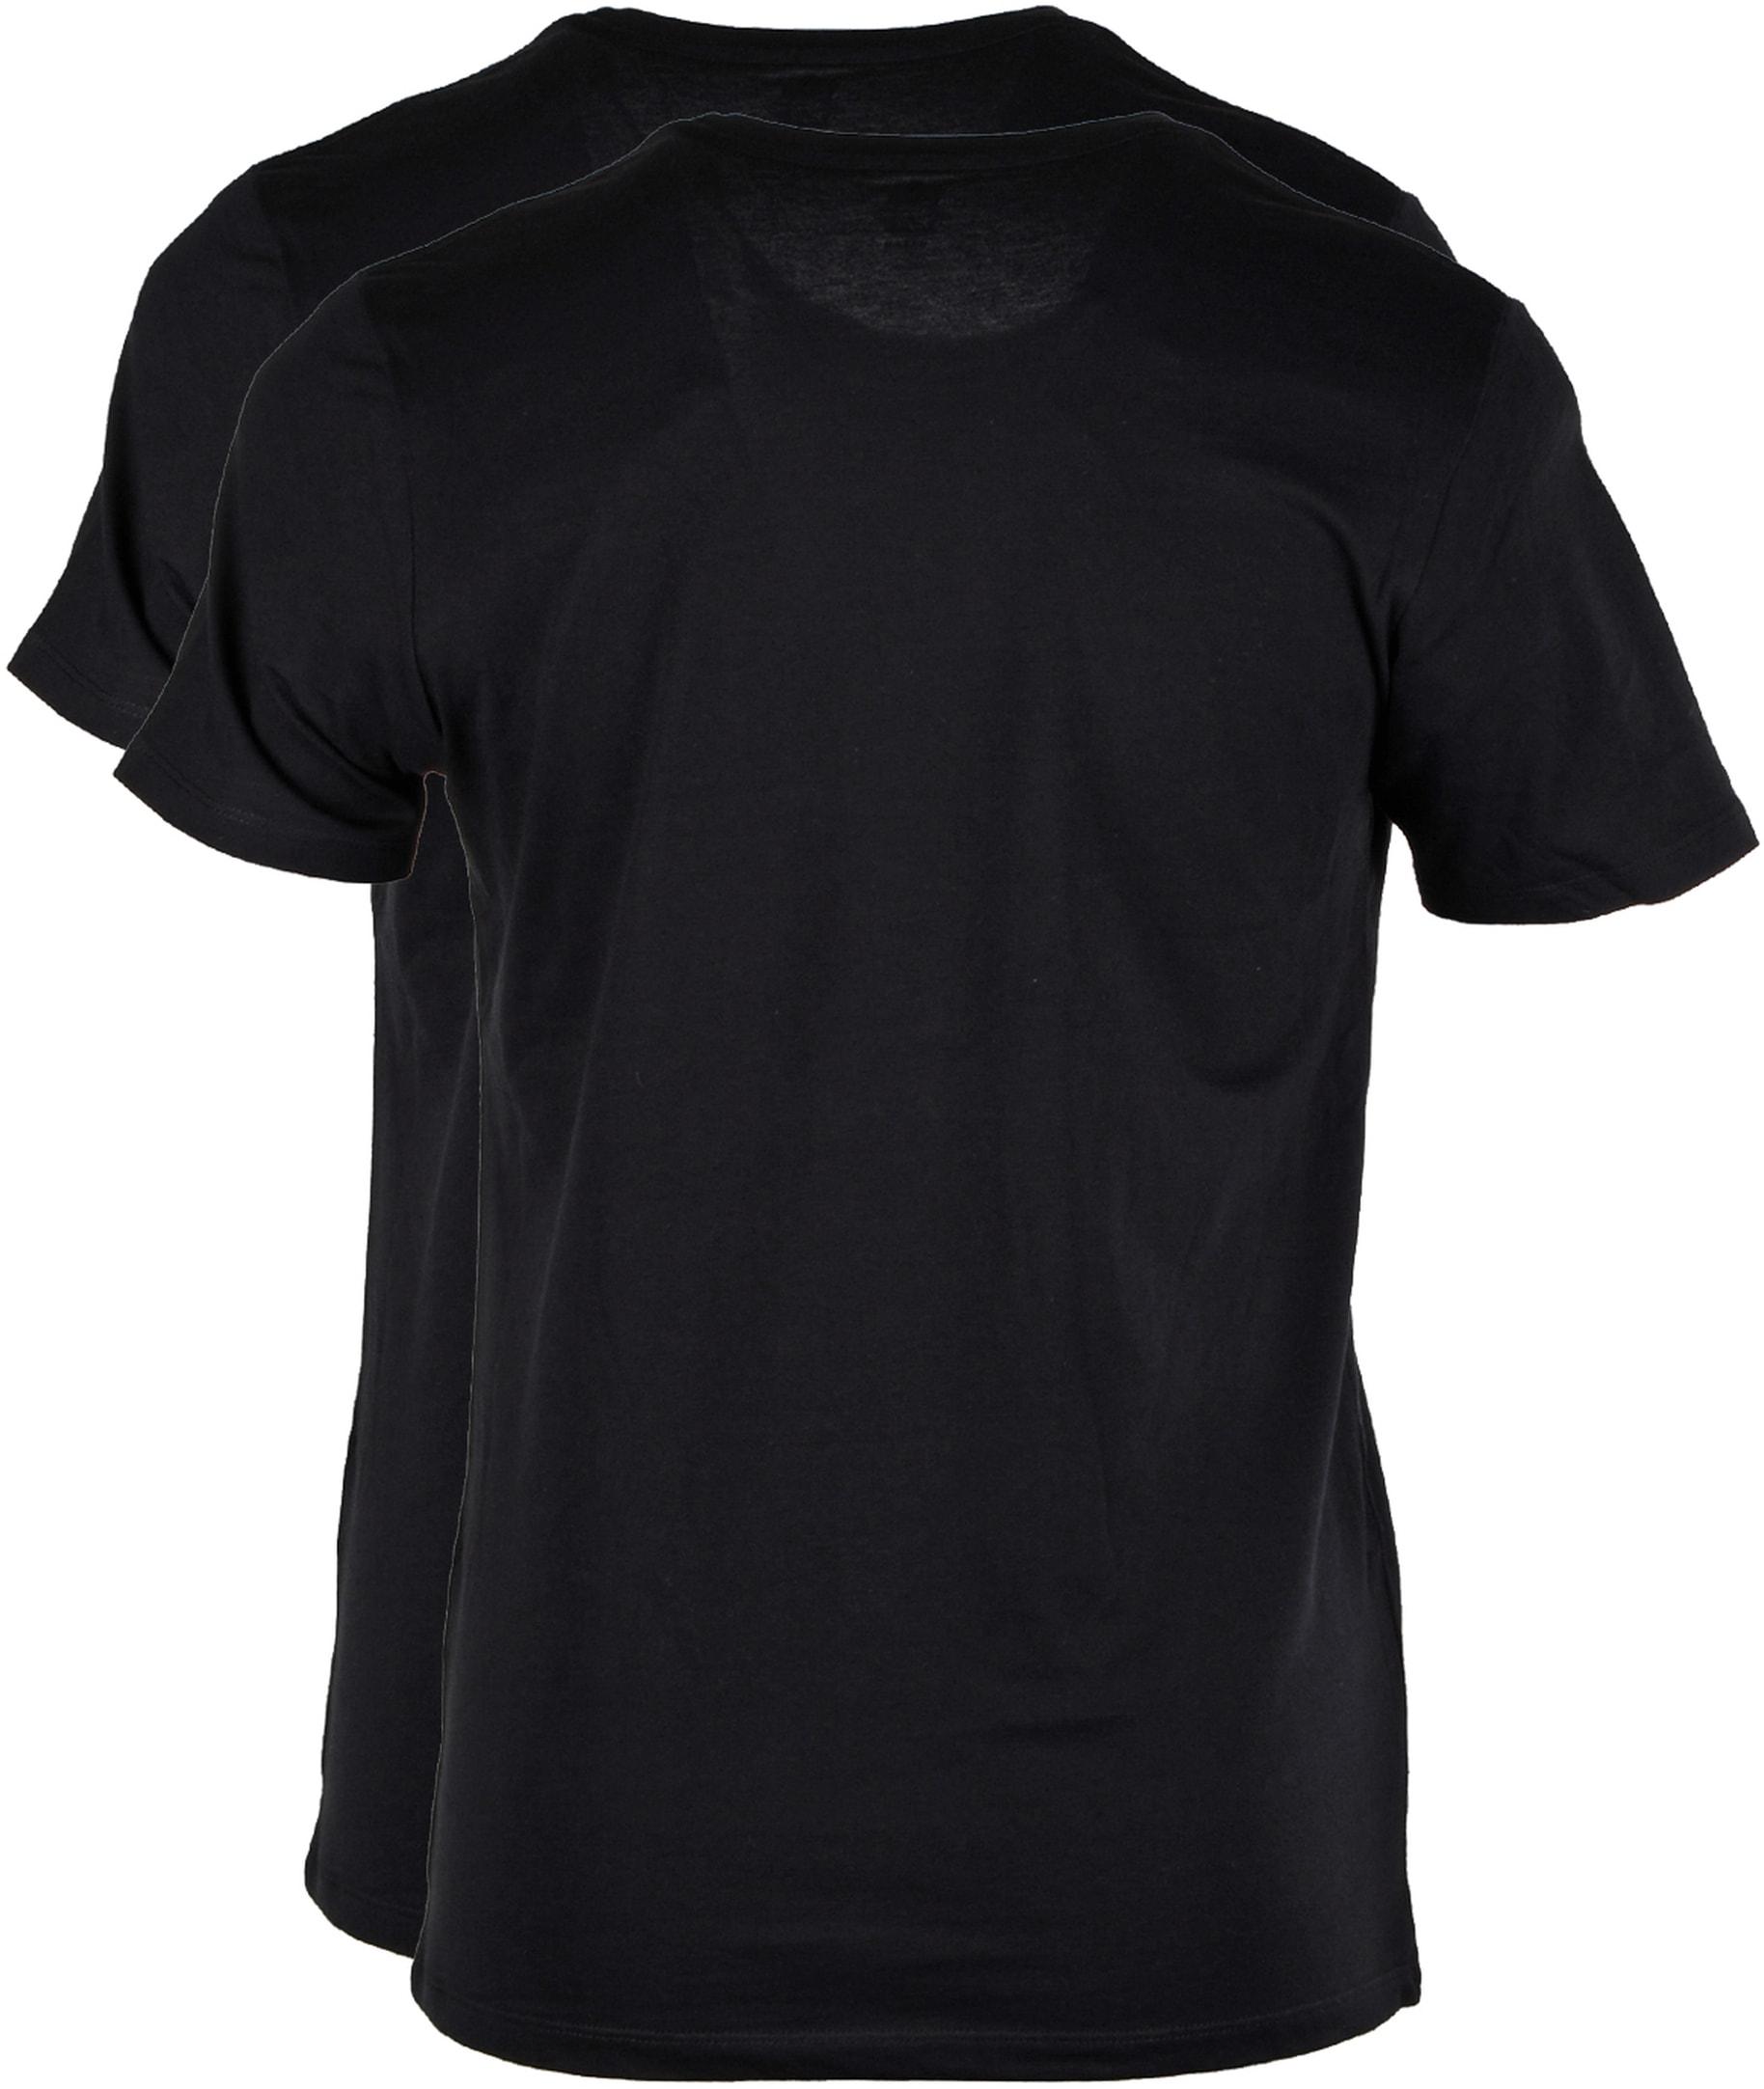 Levi's T-shirt Ronde Hals Zwart 2Pack foto 1